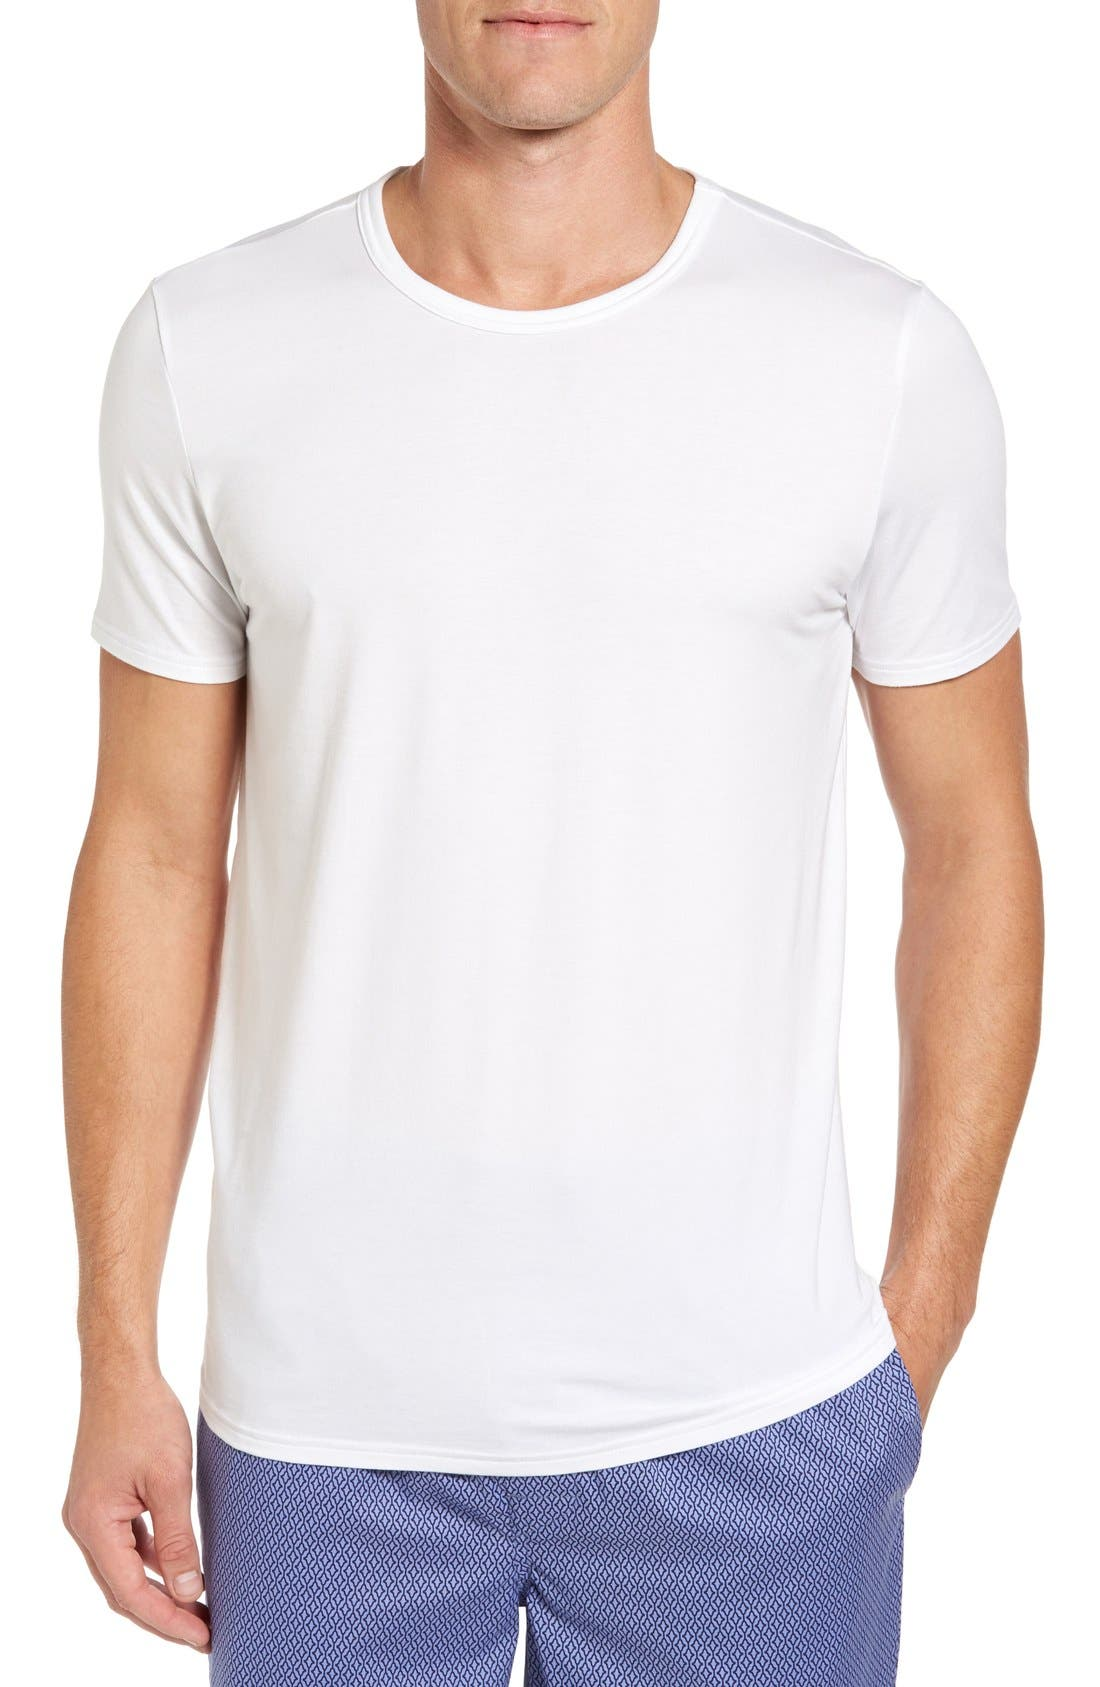 NORDSTROM MEN'S SHOP Micromodal Crewneck T-Shirt